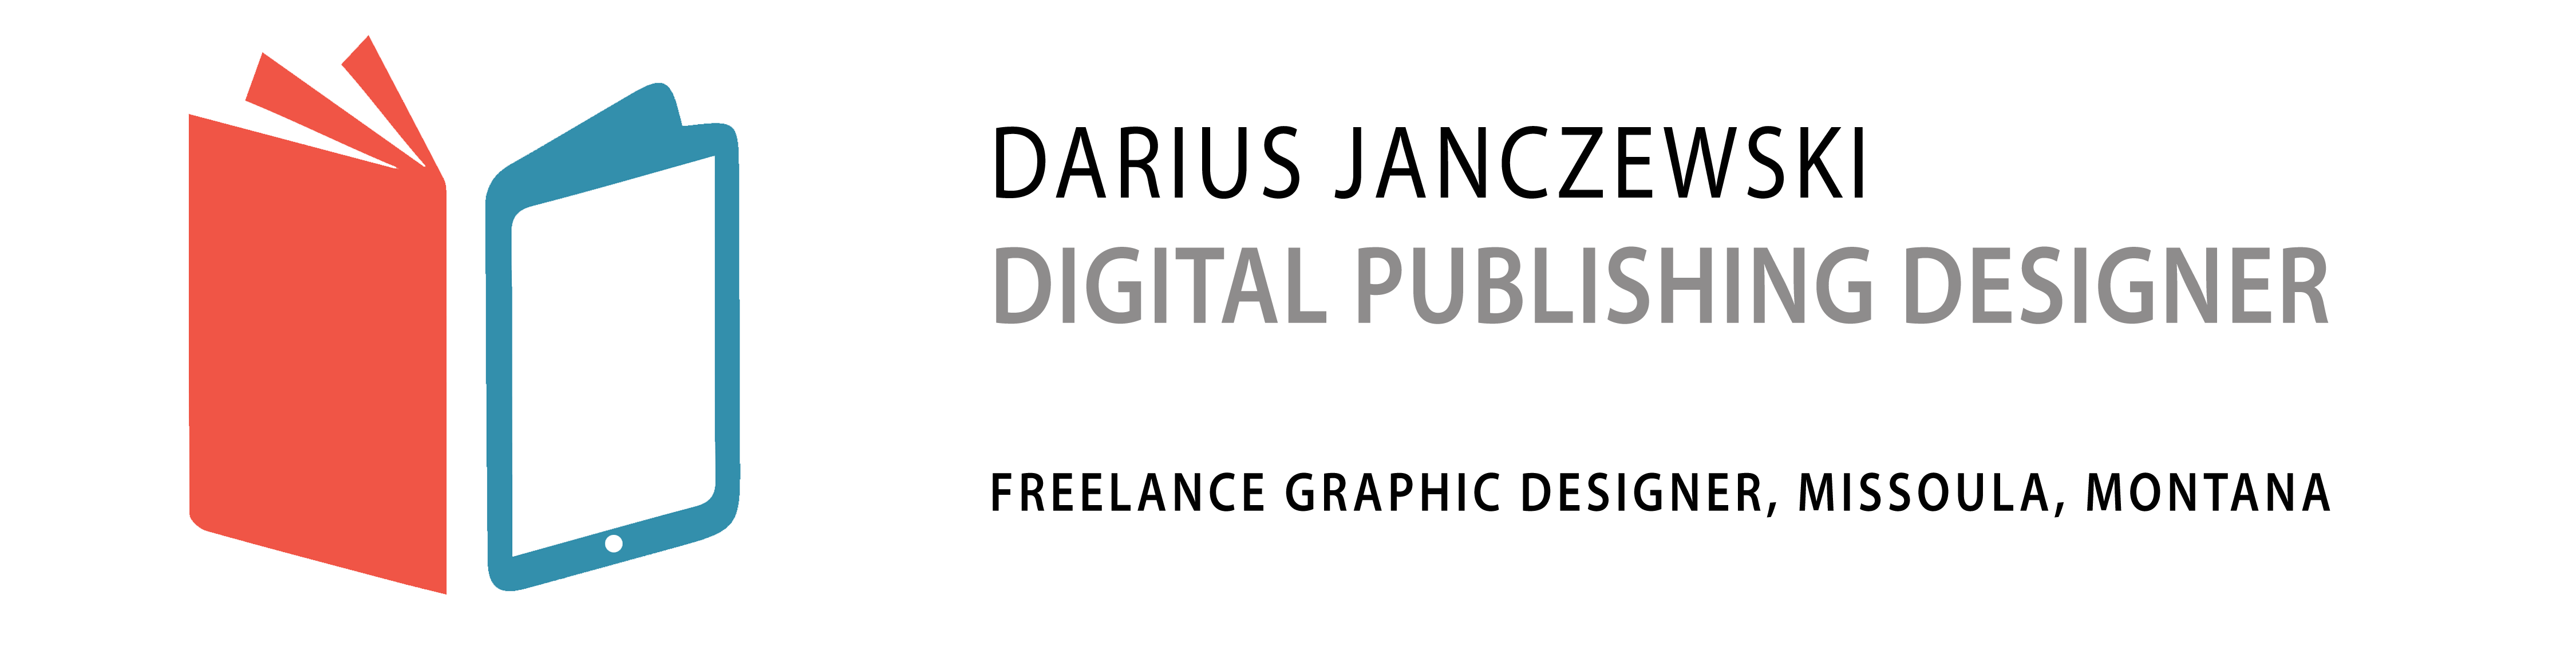 Darius Janczewski, Digital Publishing Designer, Missoula Graphic Designer, Missoula Montana USA, Book Designer, Book Cover Designer, Graphic Designer